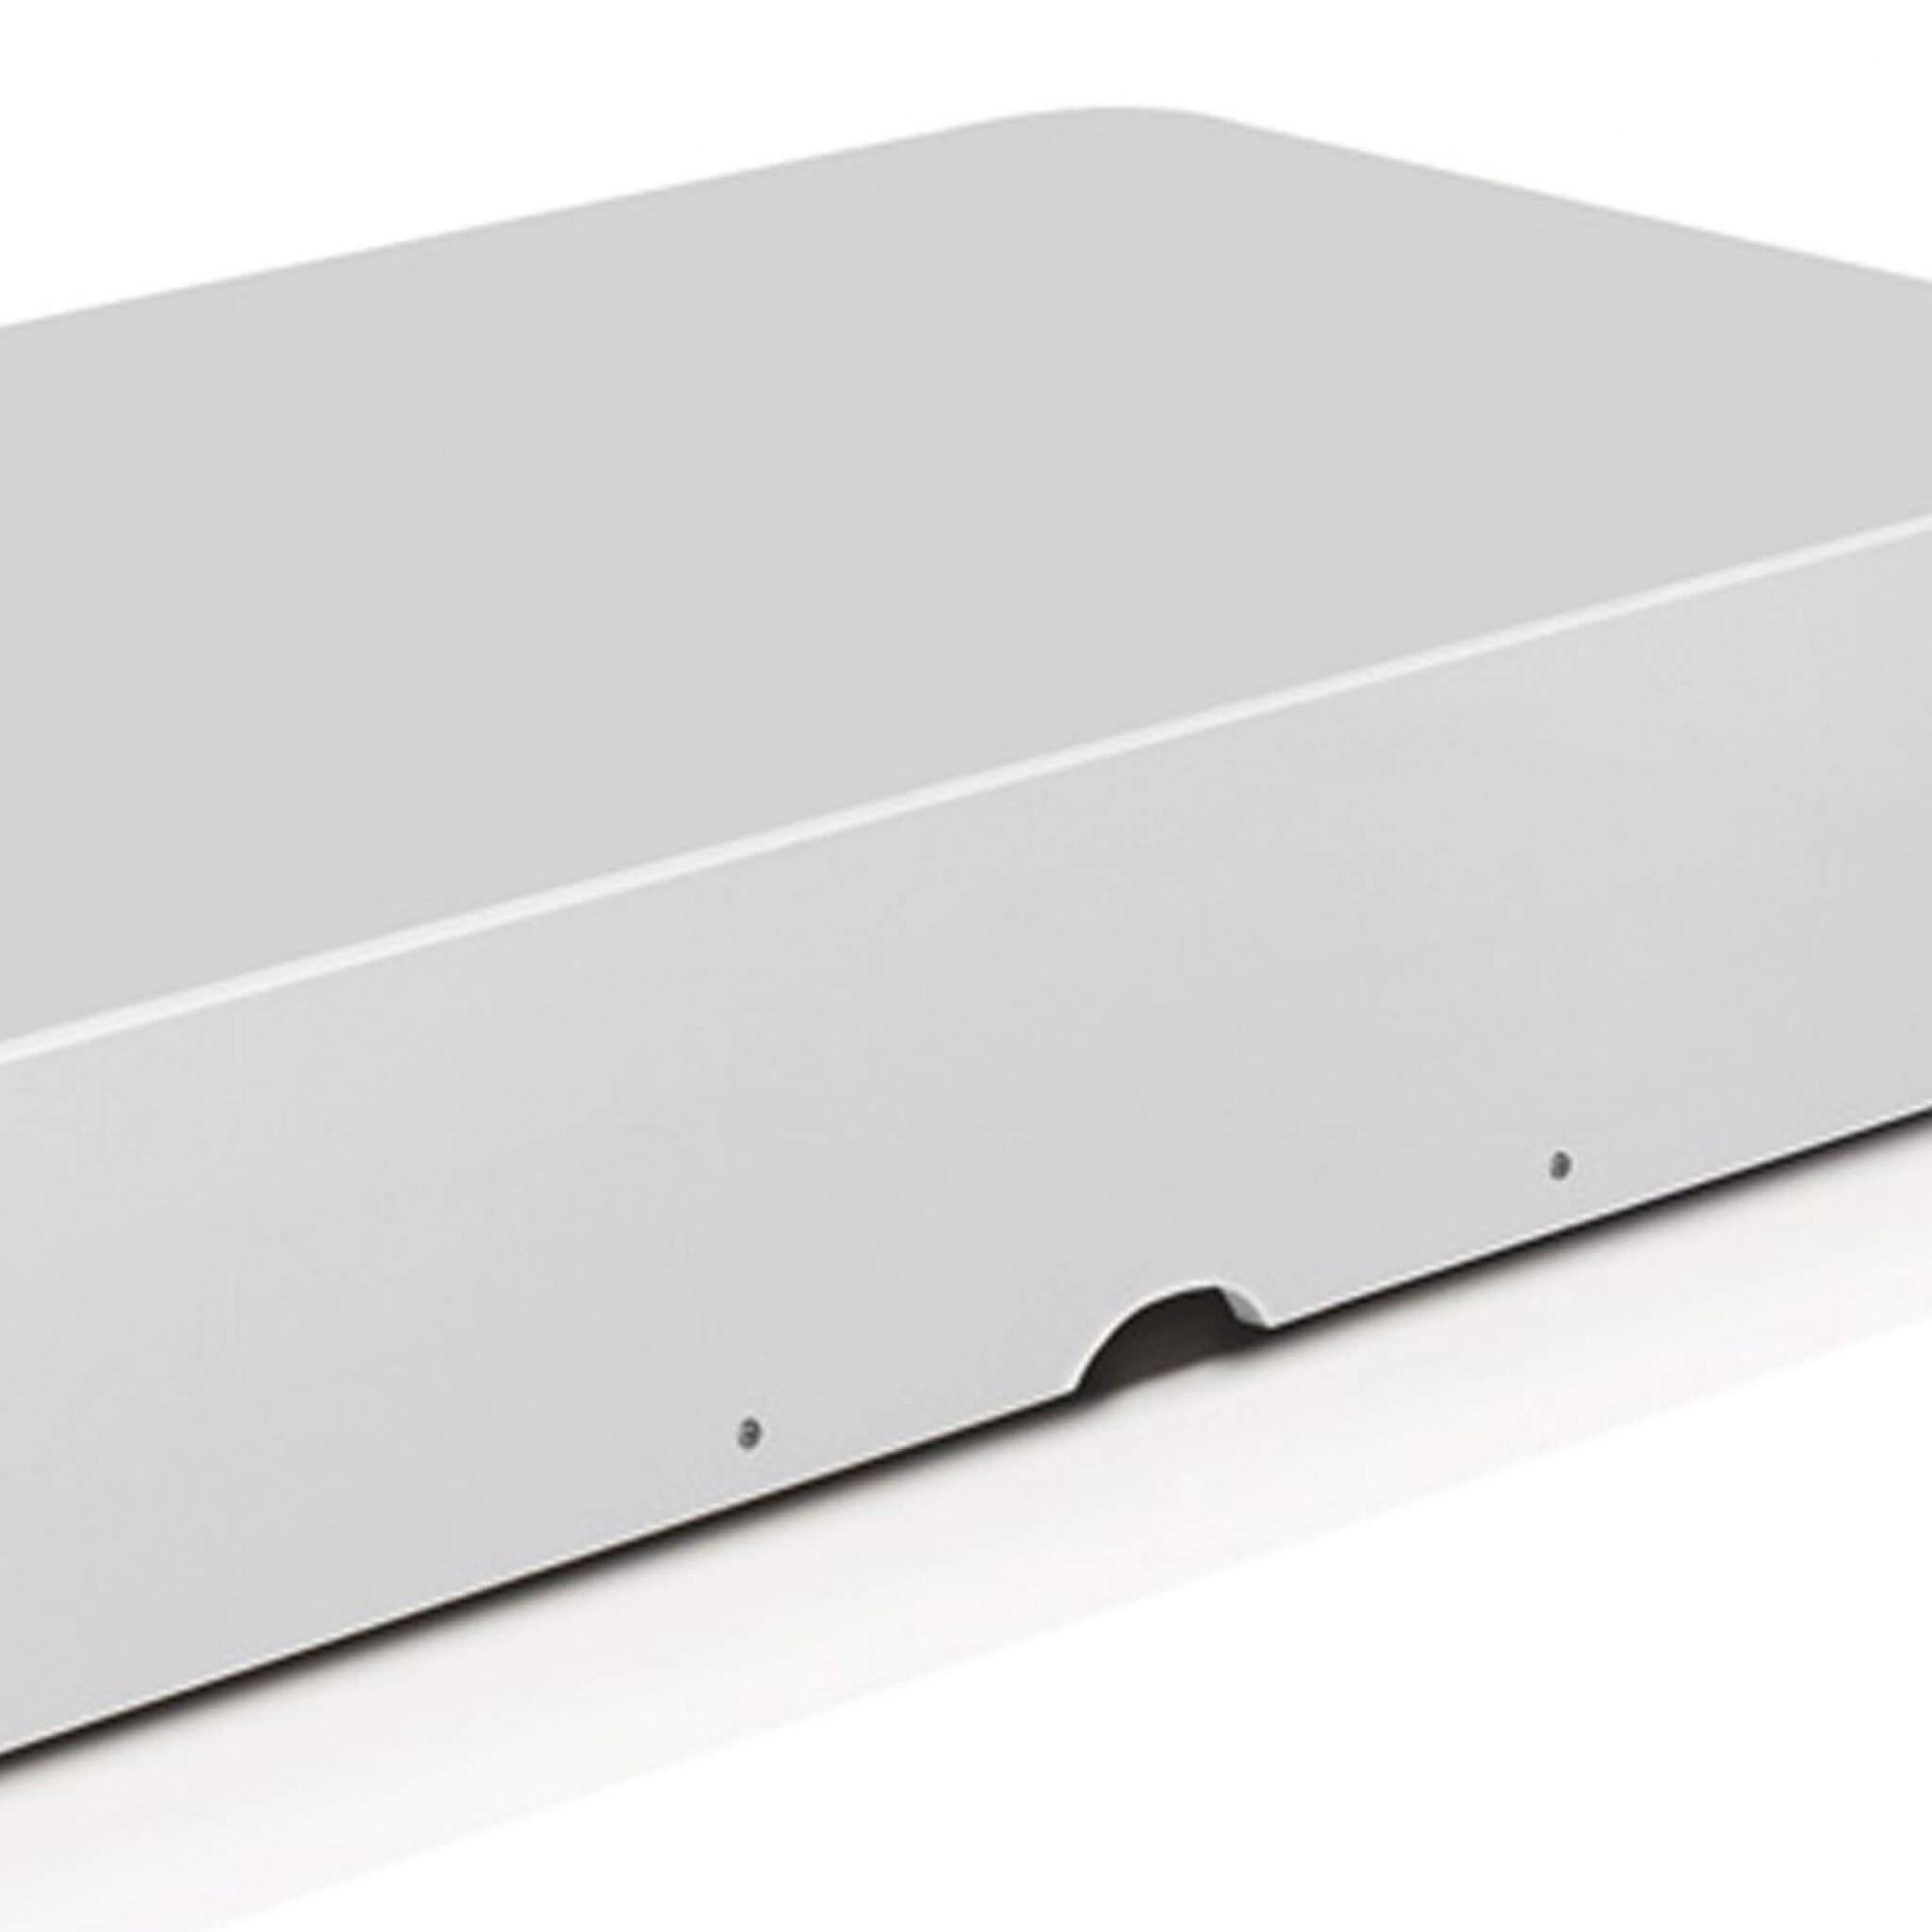 Cama Auxiliar de Solteiro 0.90 Branco - VitaMov